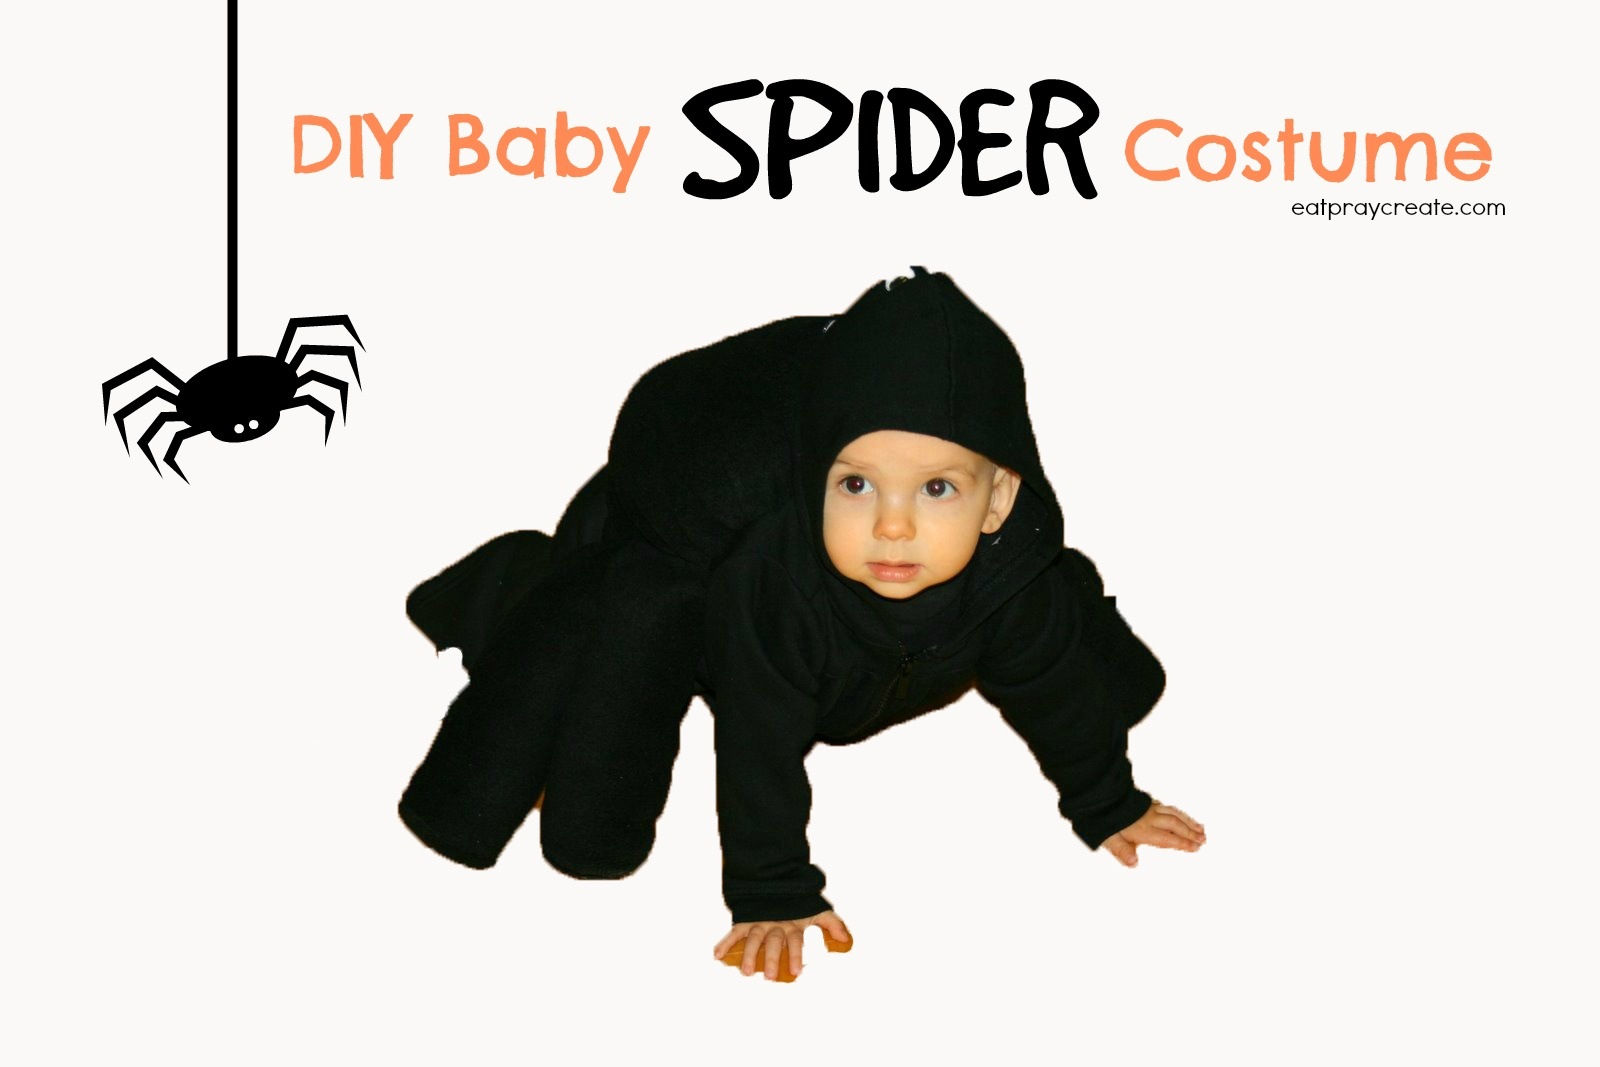 DIY Baby Spider Costume